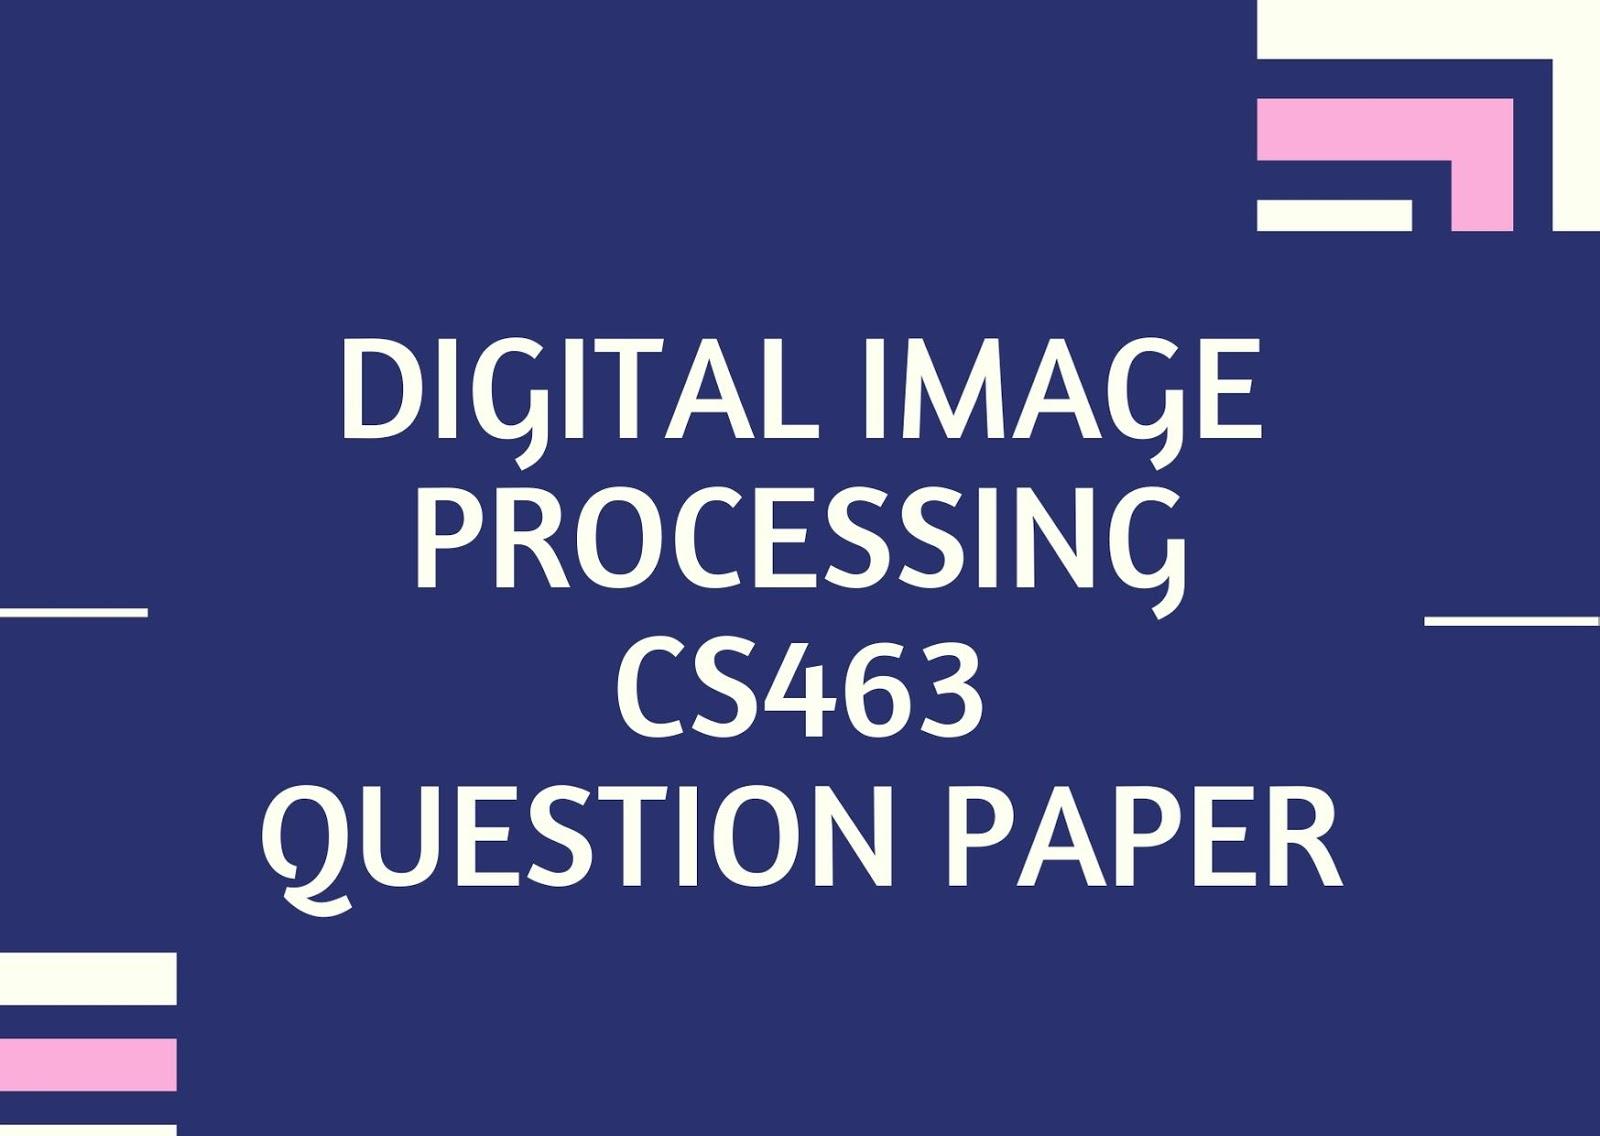 Digital Image Processing | CS463 | Question Papers (2015 batch)